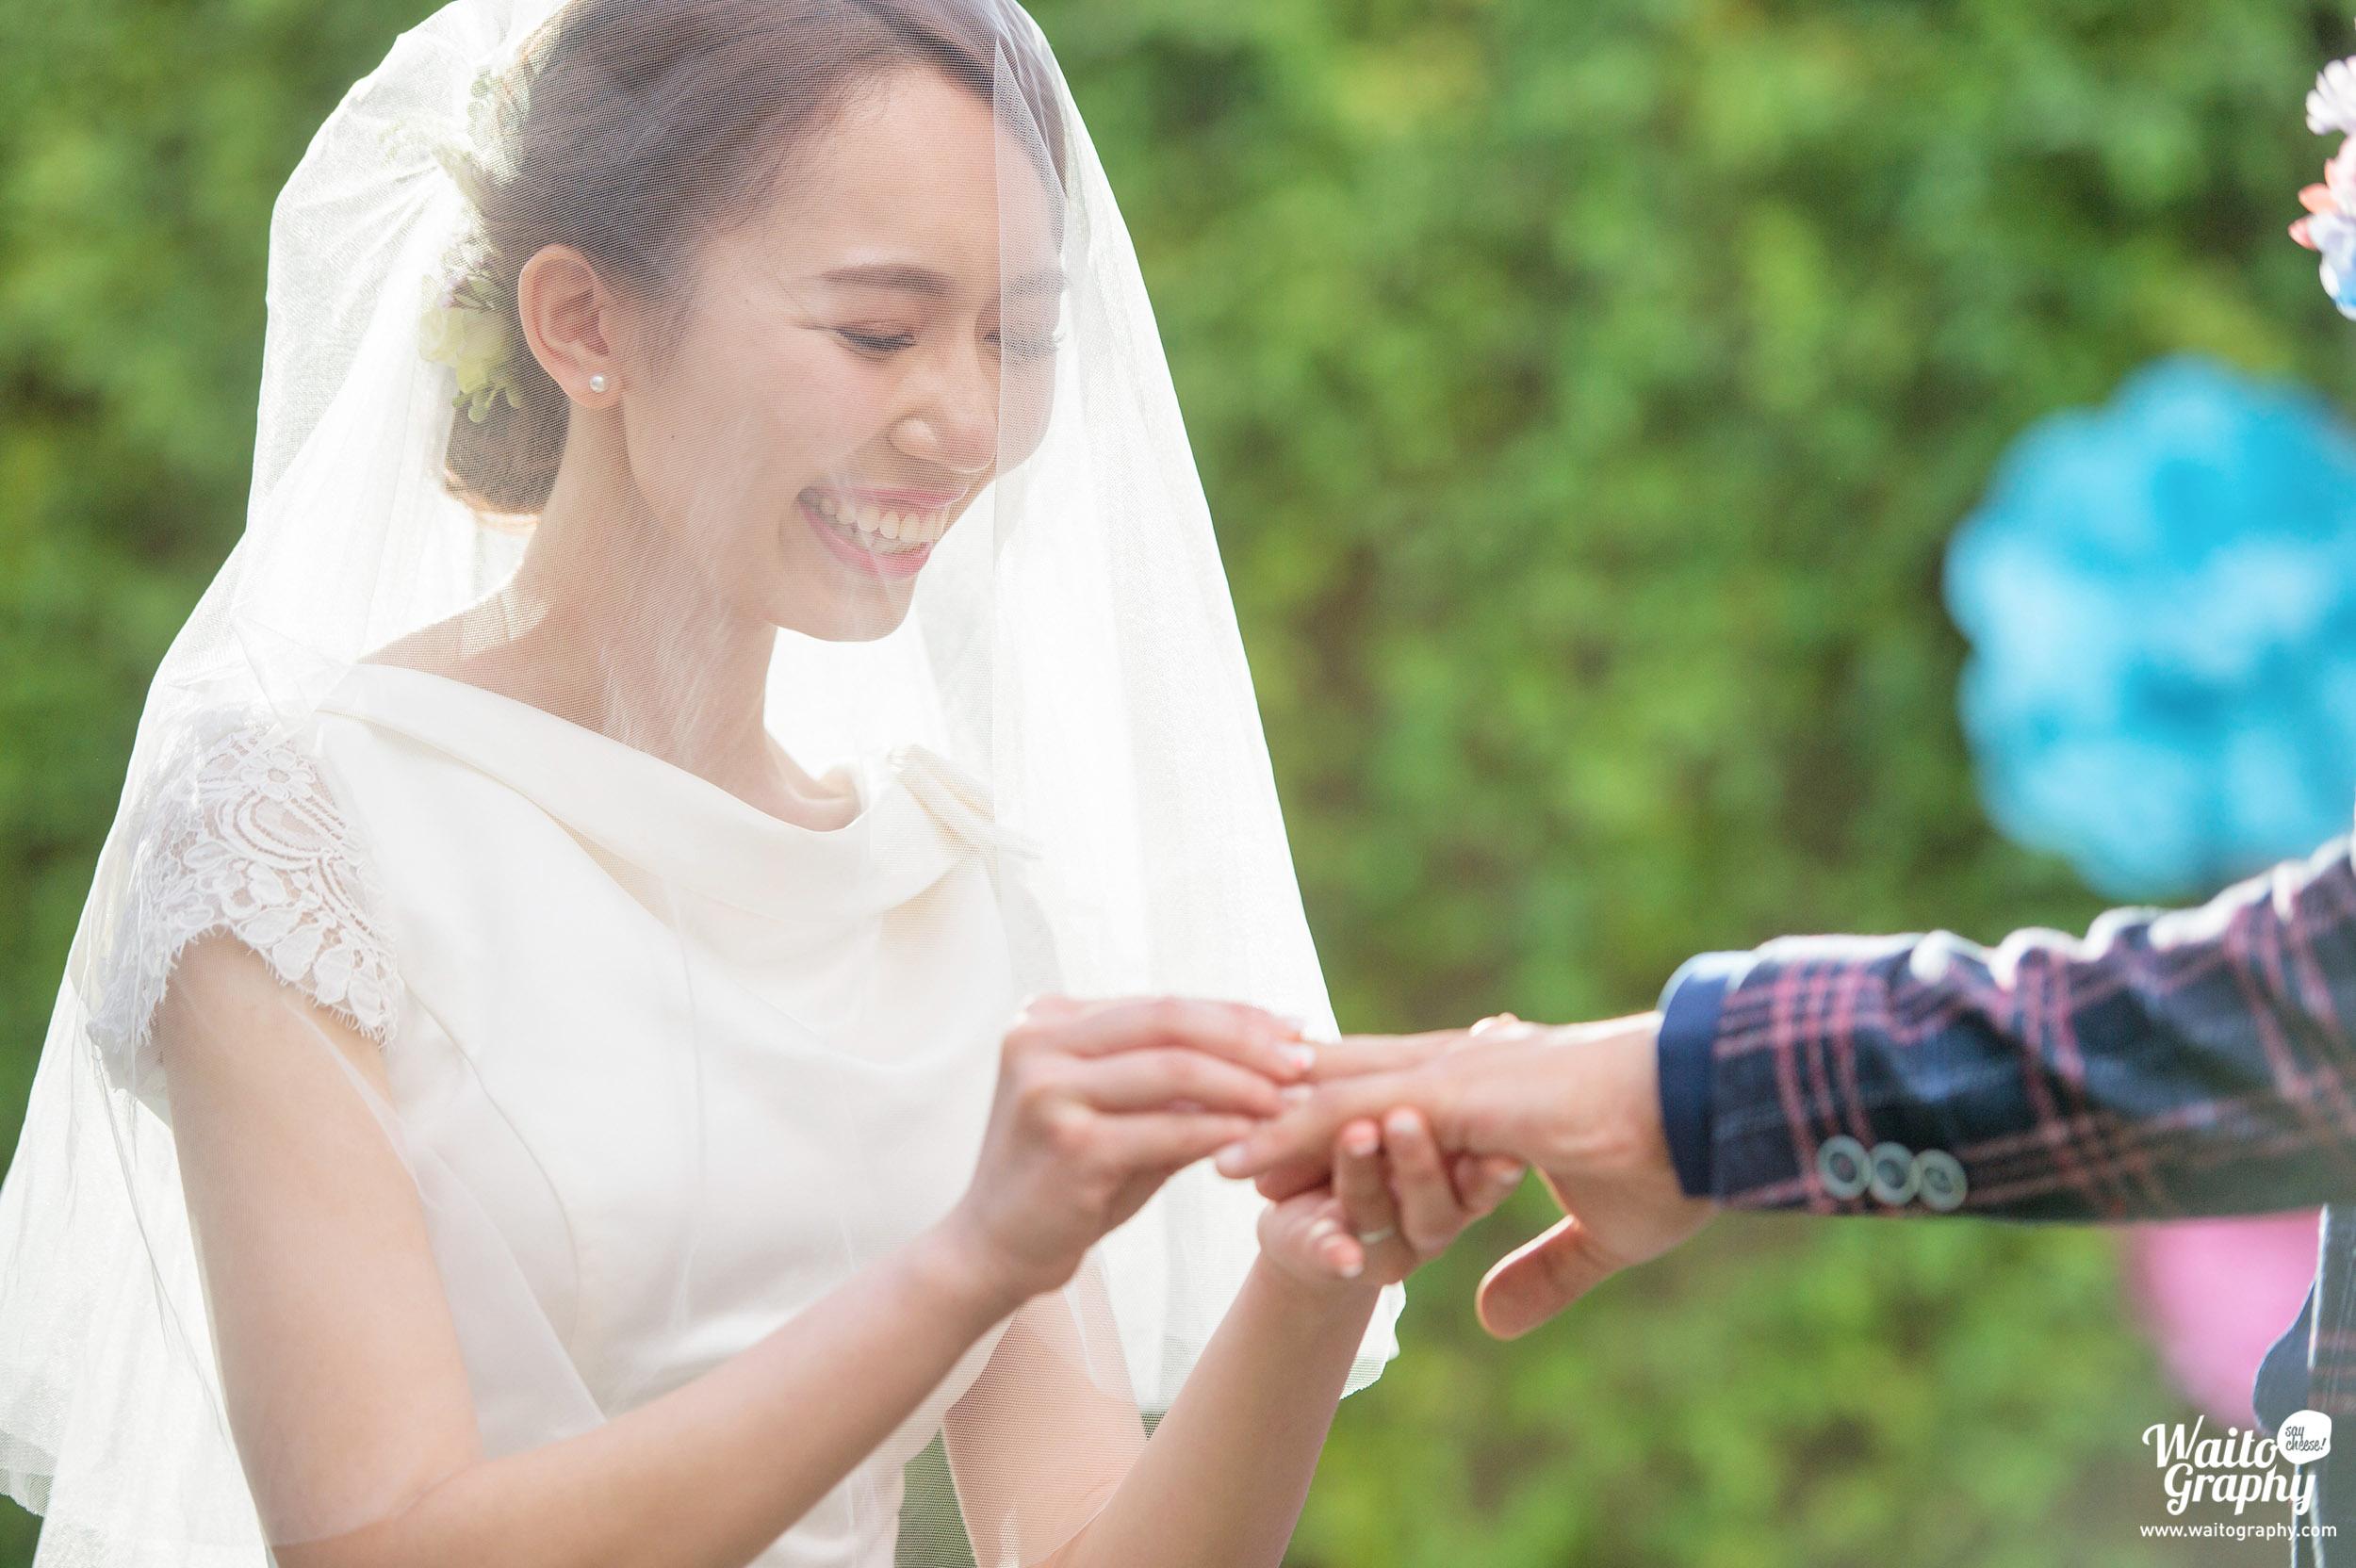 Bride's Joyous wedding moment at HK ZCB Zero Carbon Building captured by hk wedding photographer